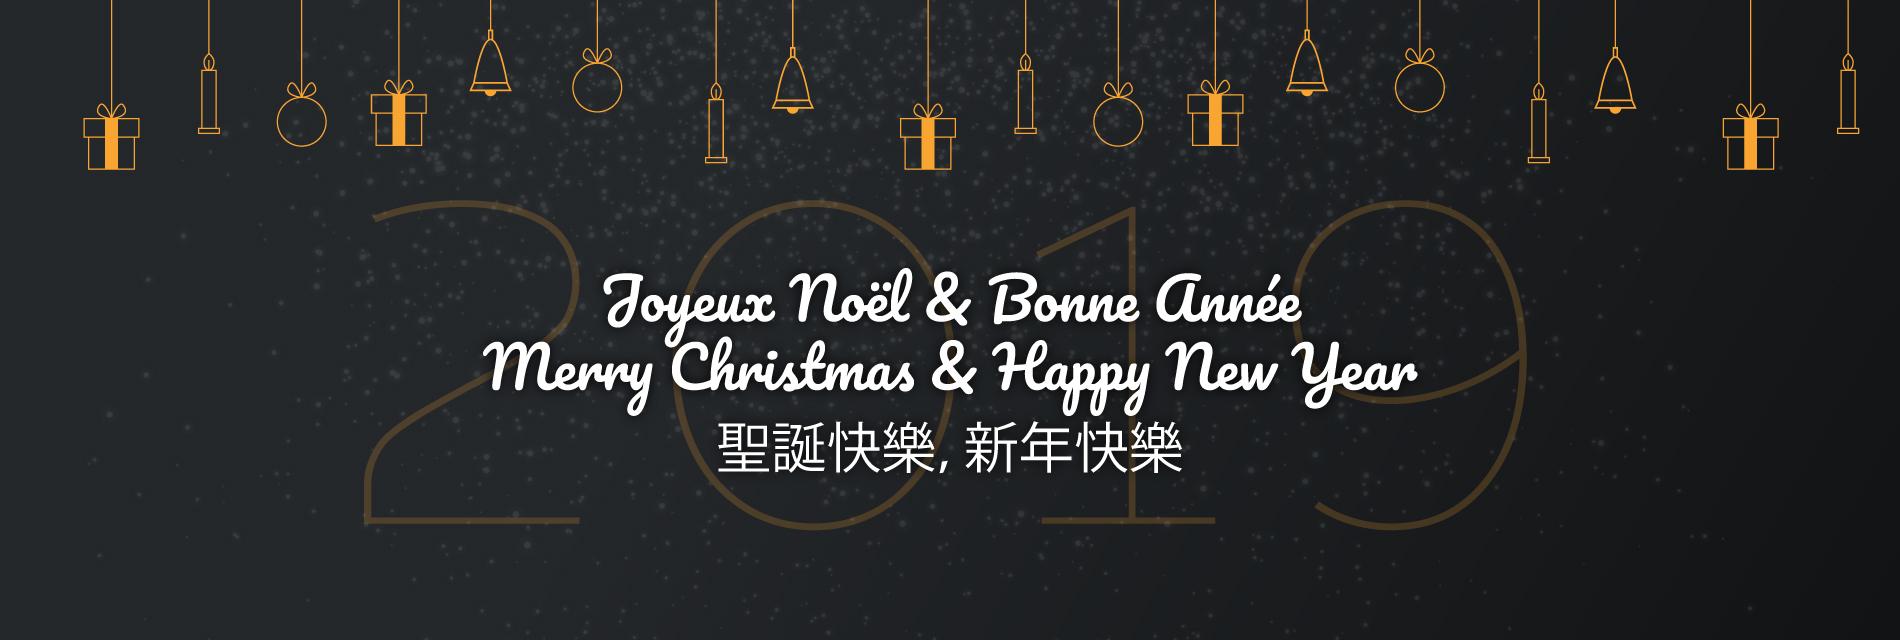 Joyeux Noël & Bonne année 2019 !